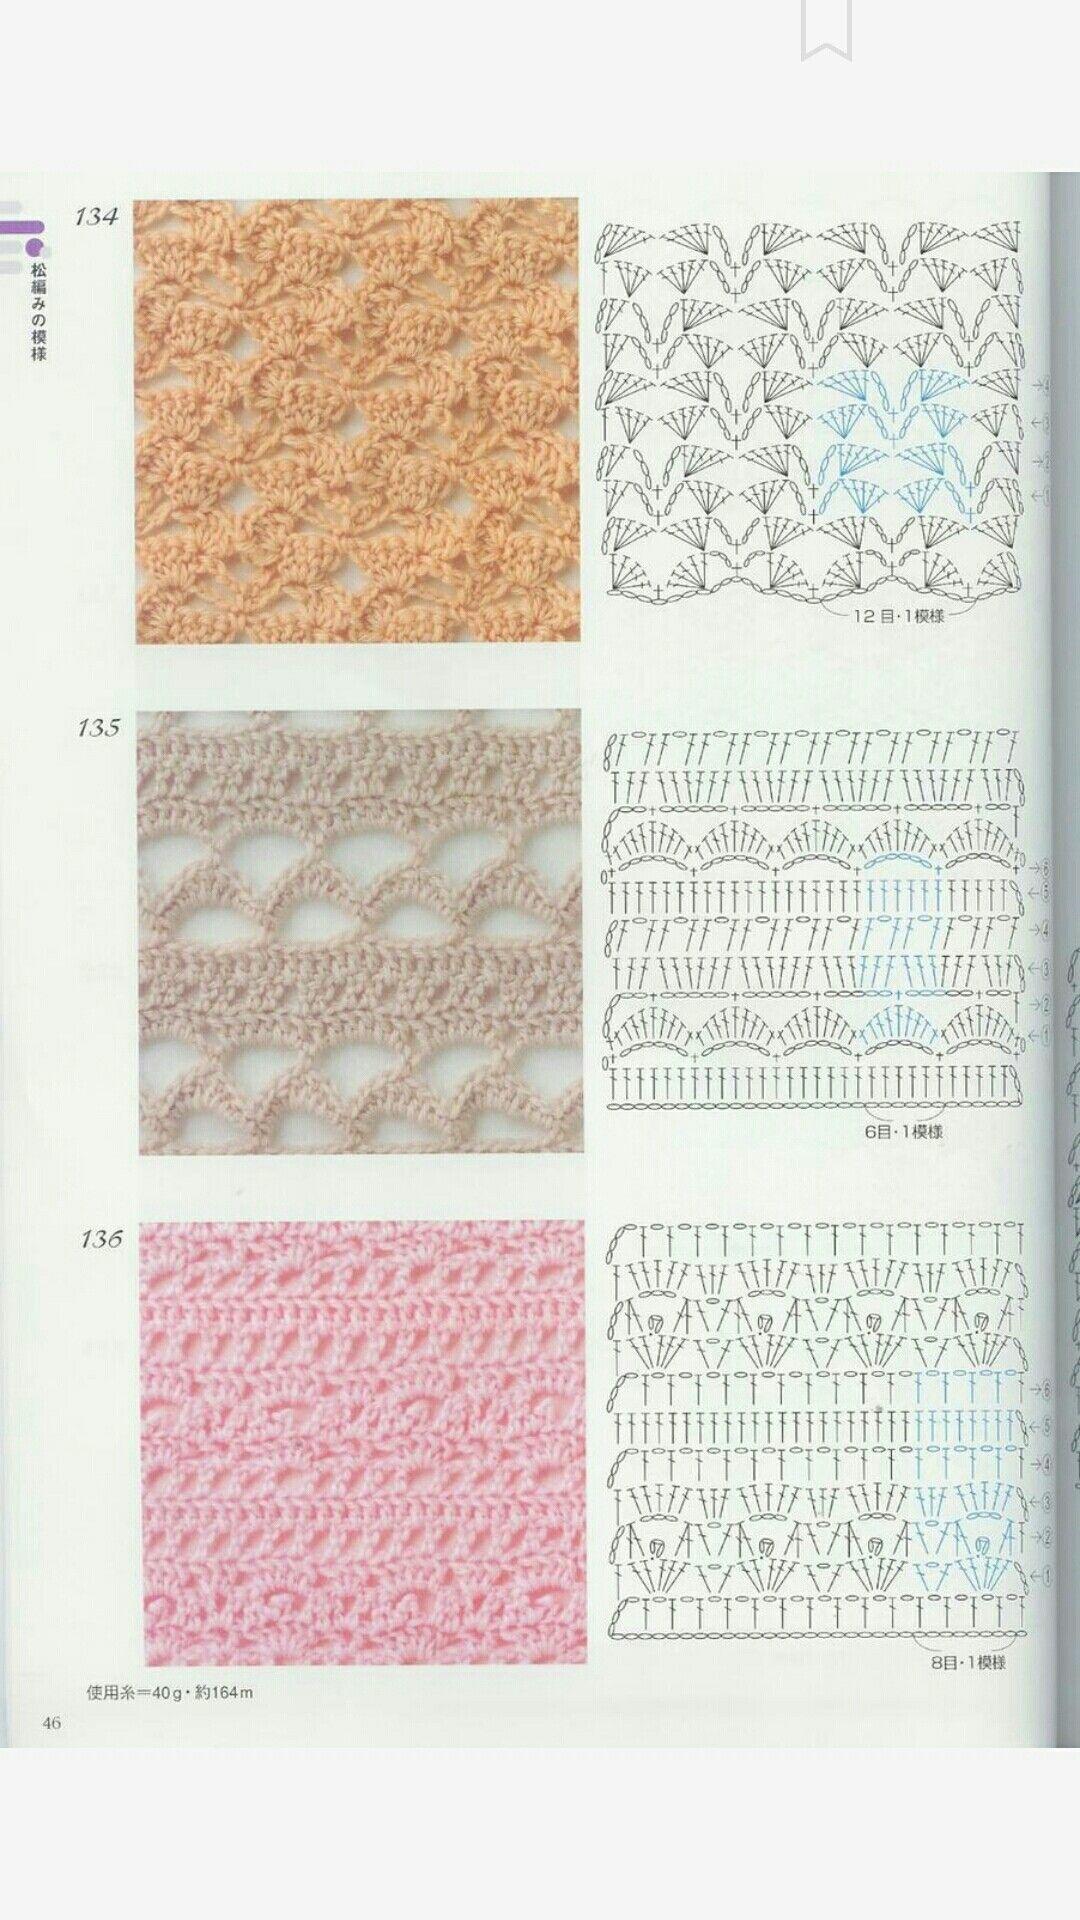 Pin de Maria Del Carmen Michini en patrones | Pinterest | Puntadas ...